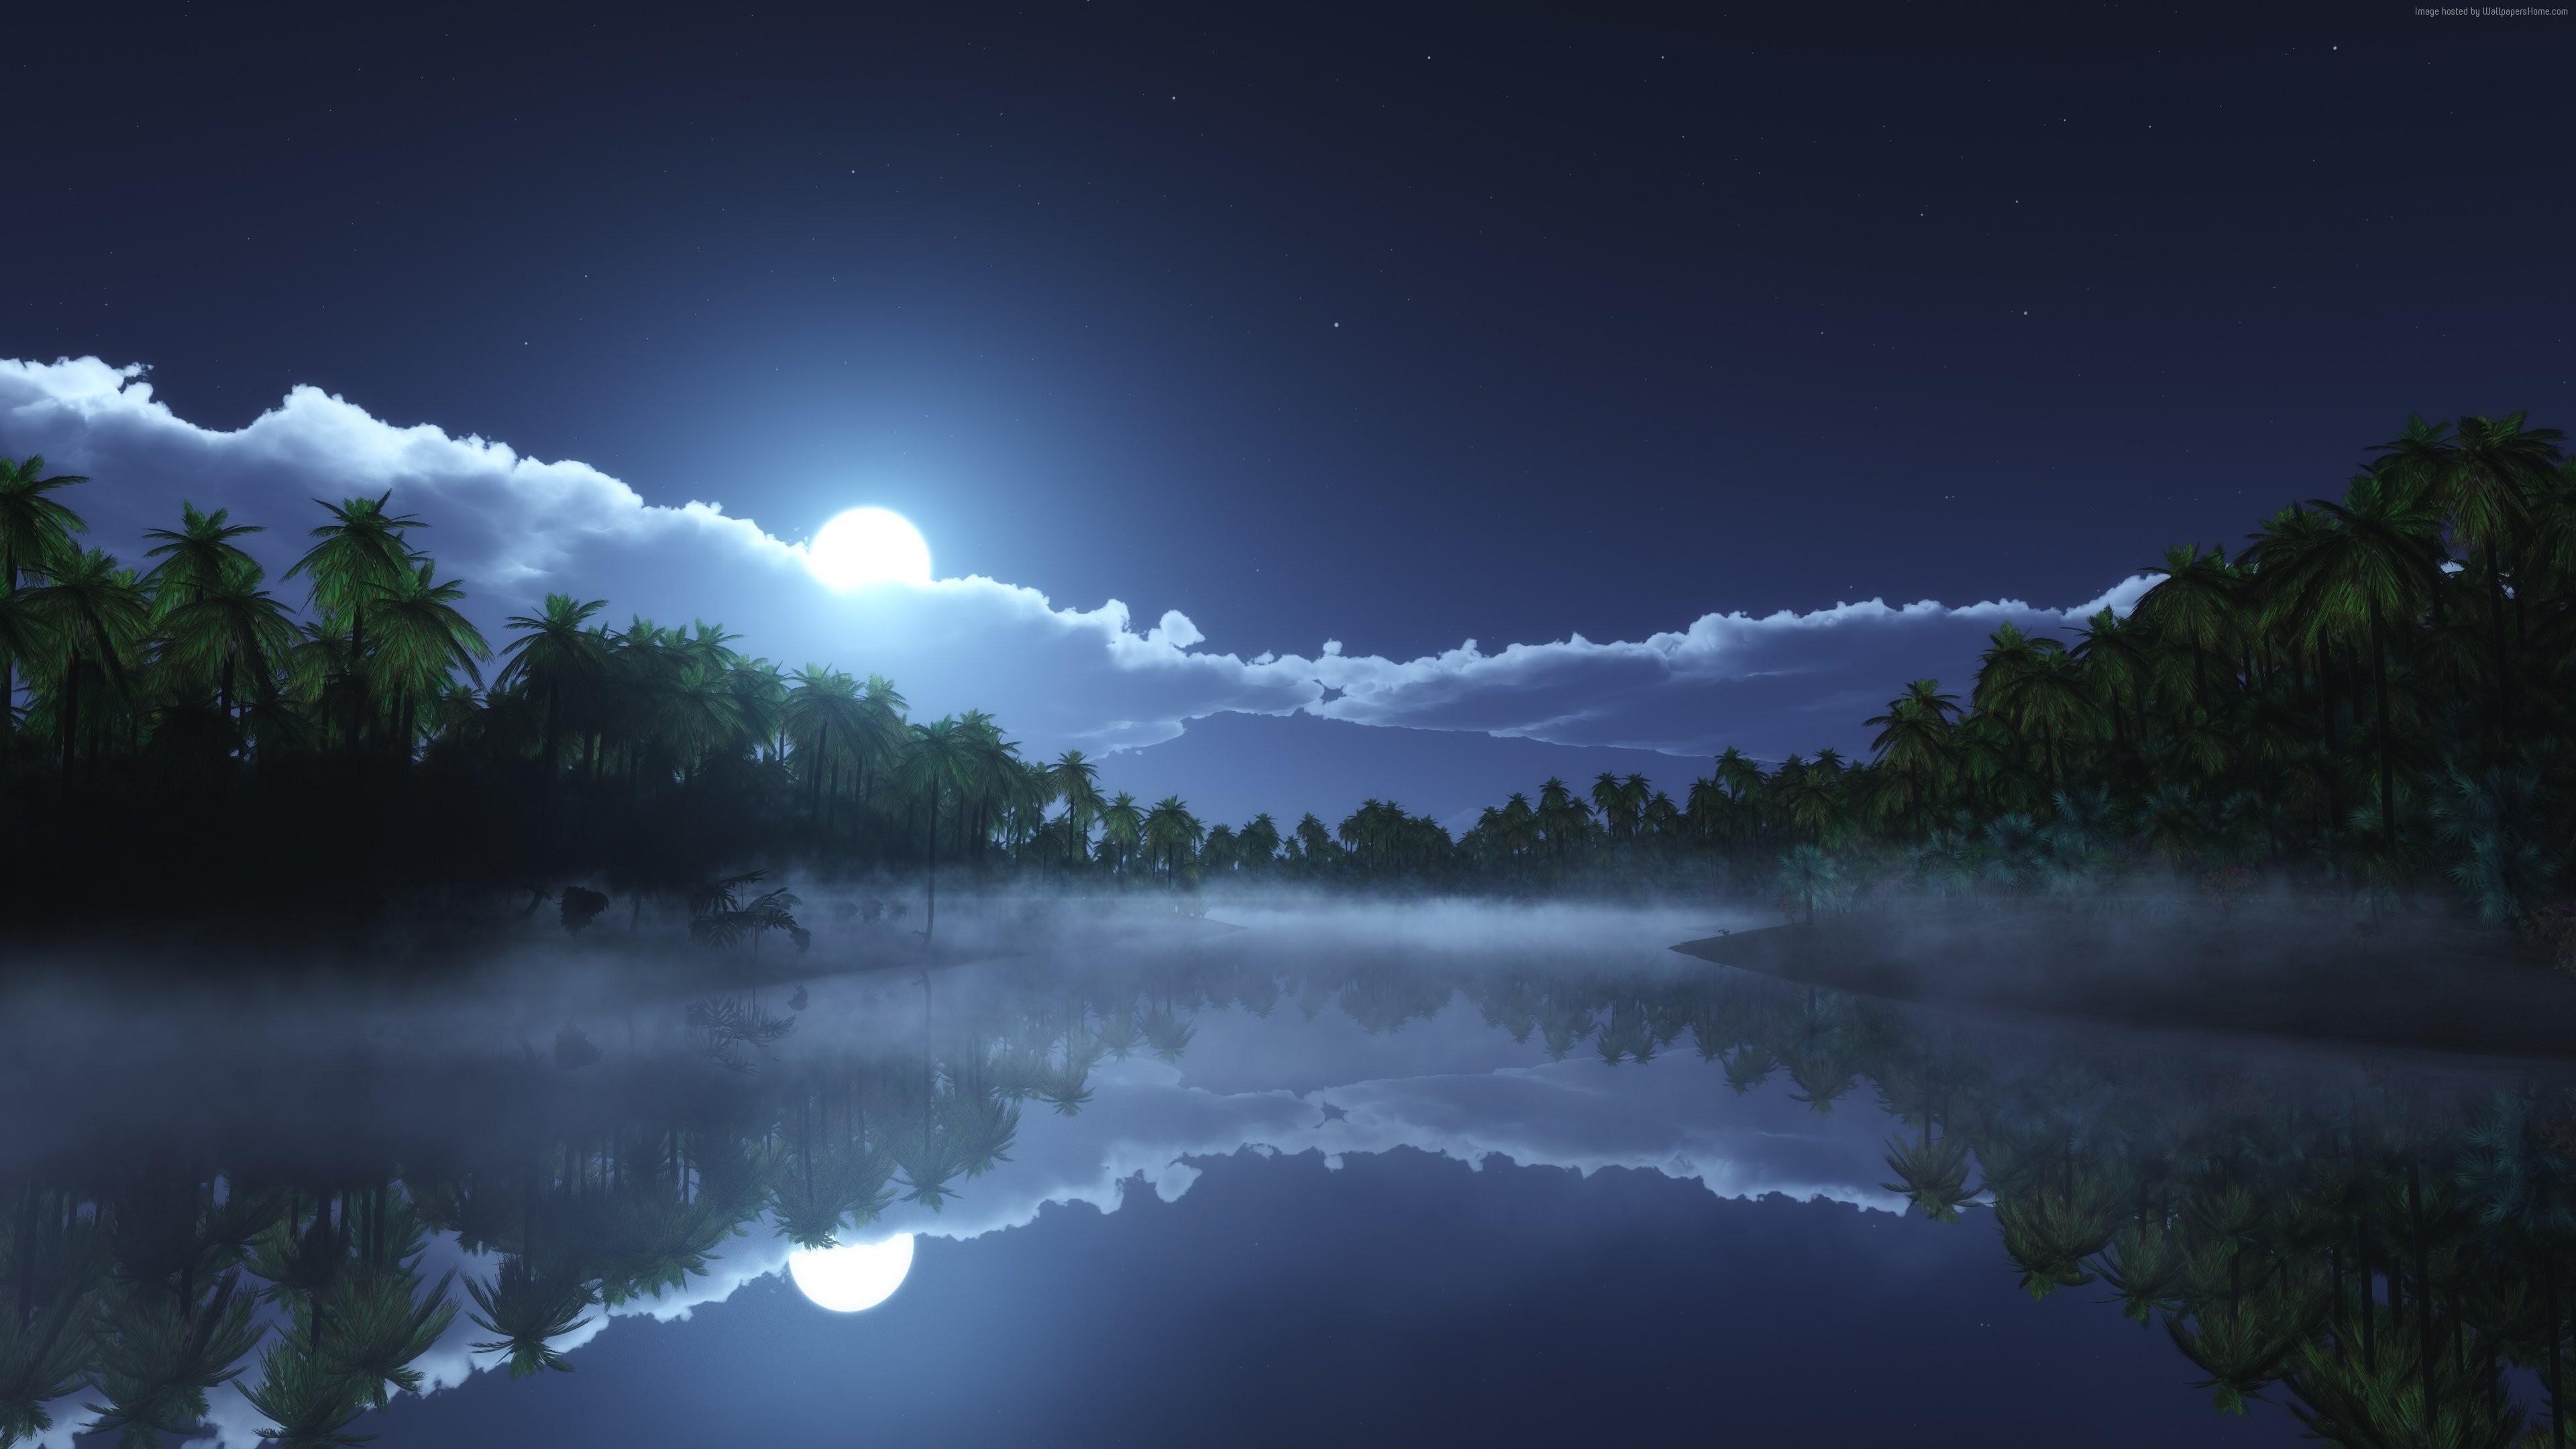 Explore Good Night Beautiful, Beautiful Moon, and more!